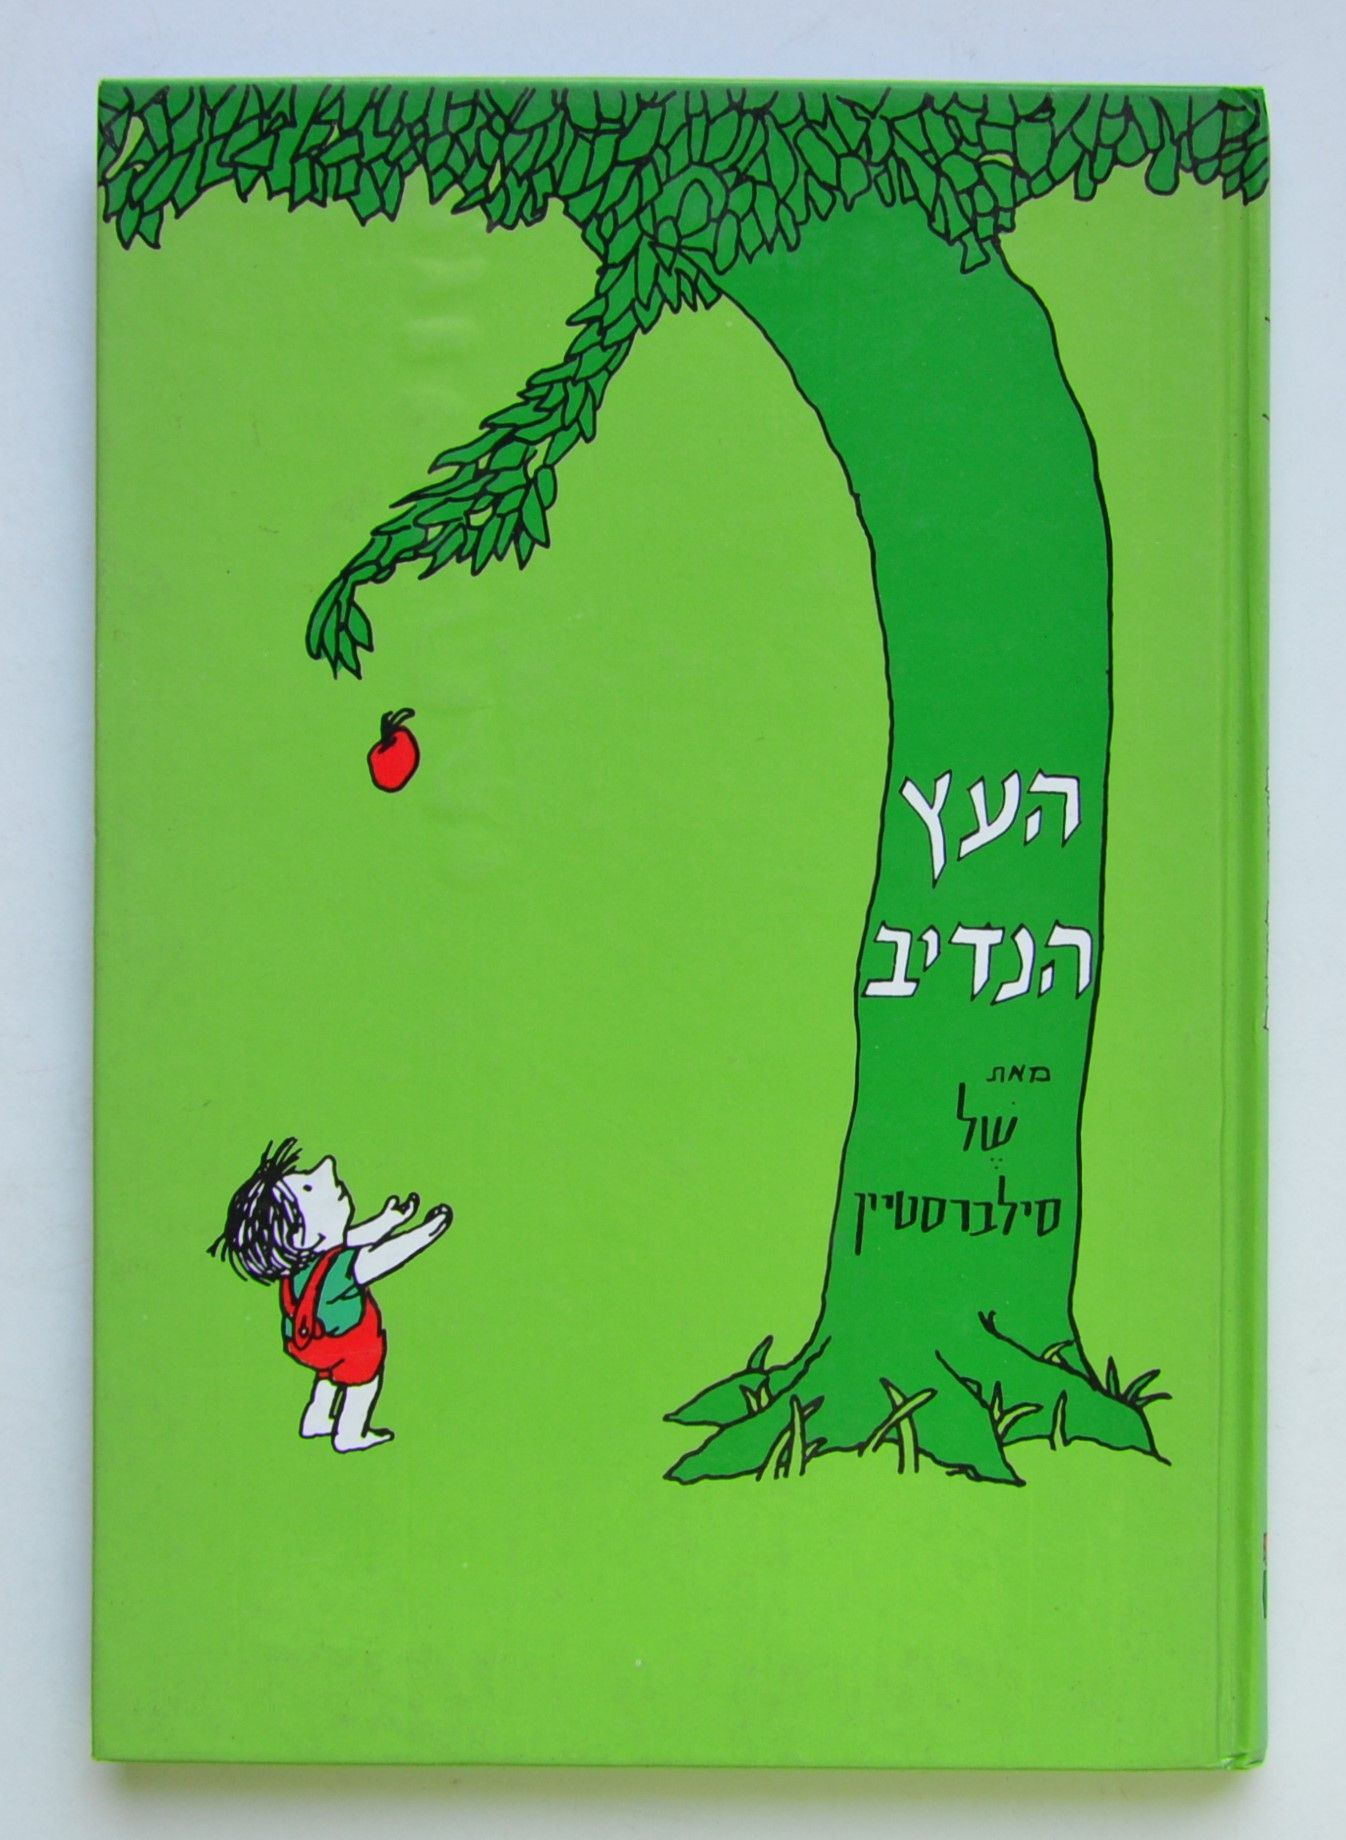 Ha-etz ha-nadiv = The giving tree by Shel Silverstein (Hebrew Edition)